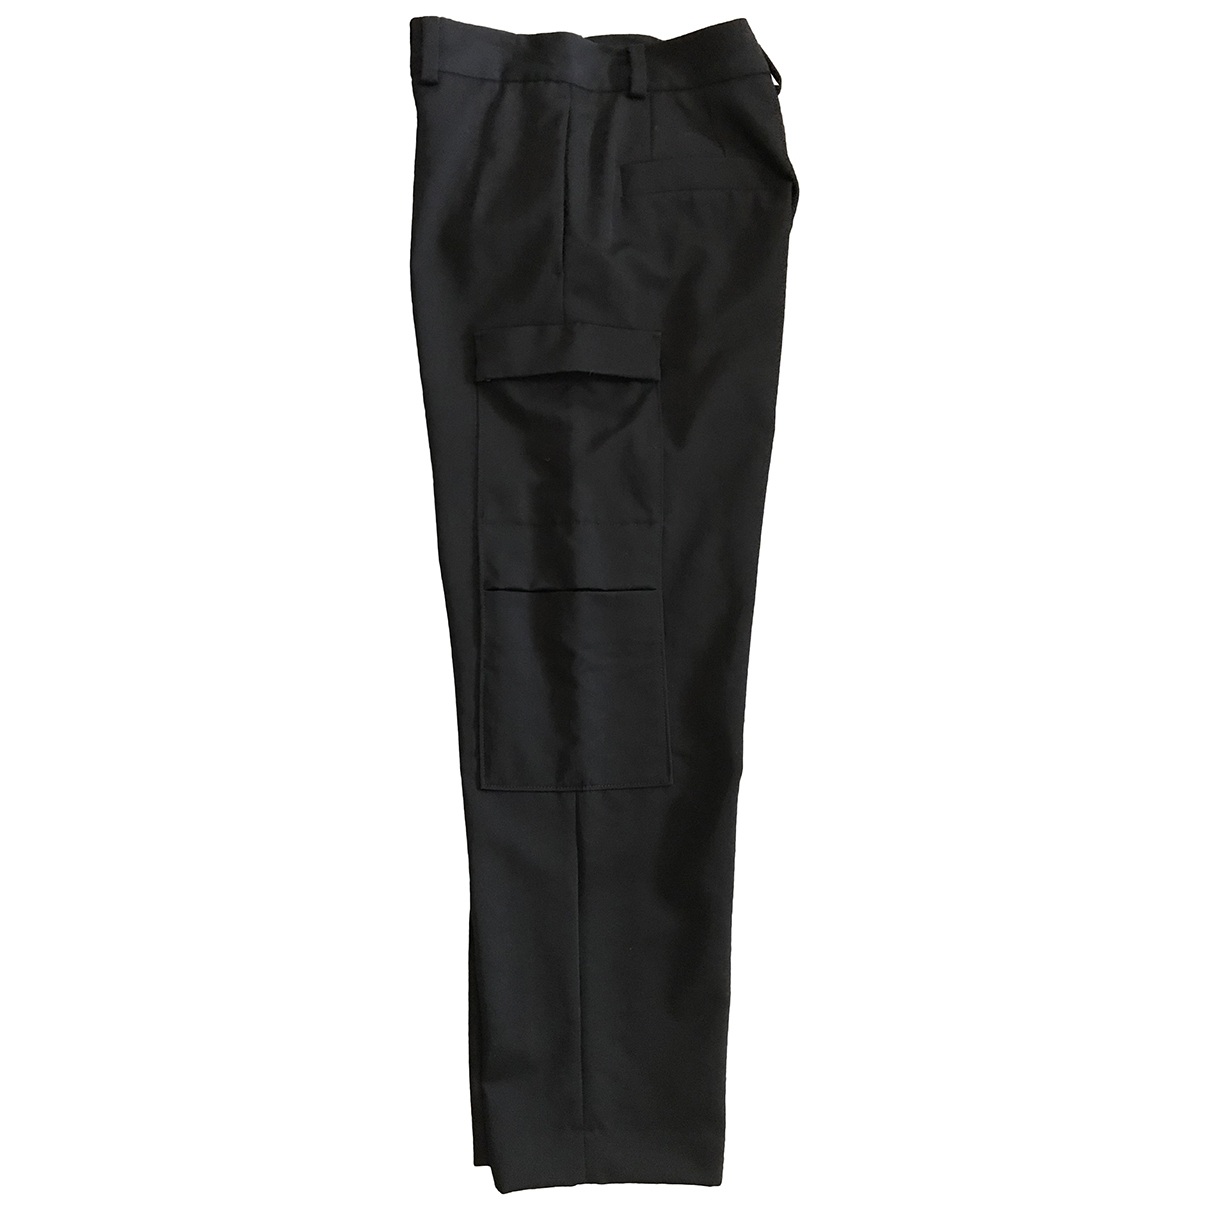 Cos \N Black Wool Trousers for Men 50 IT